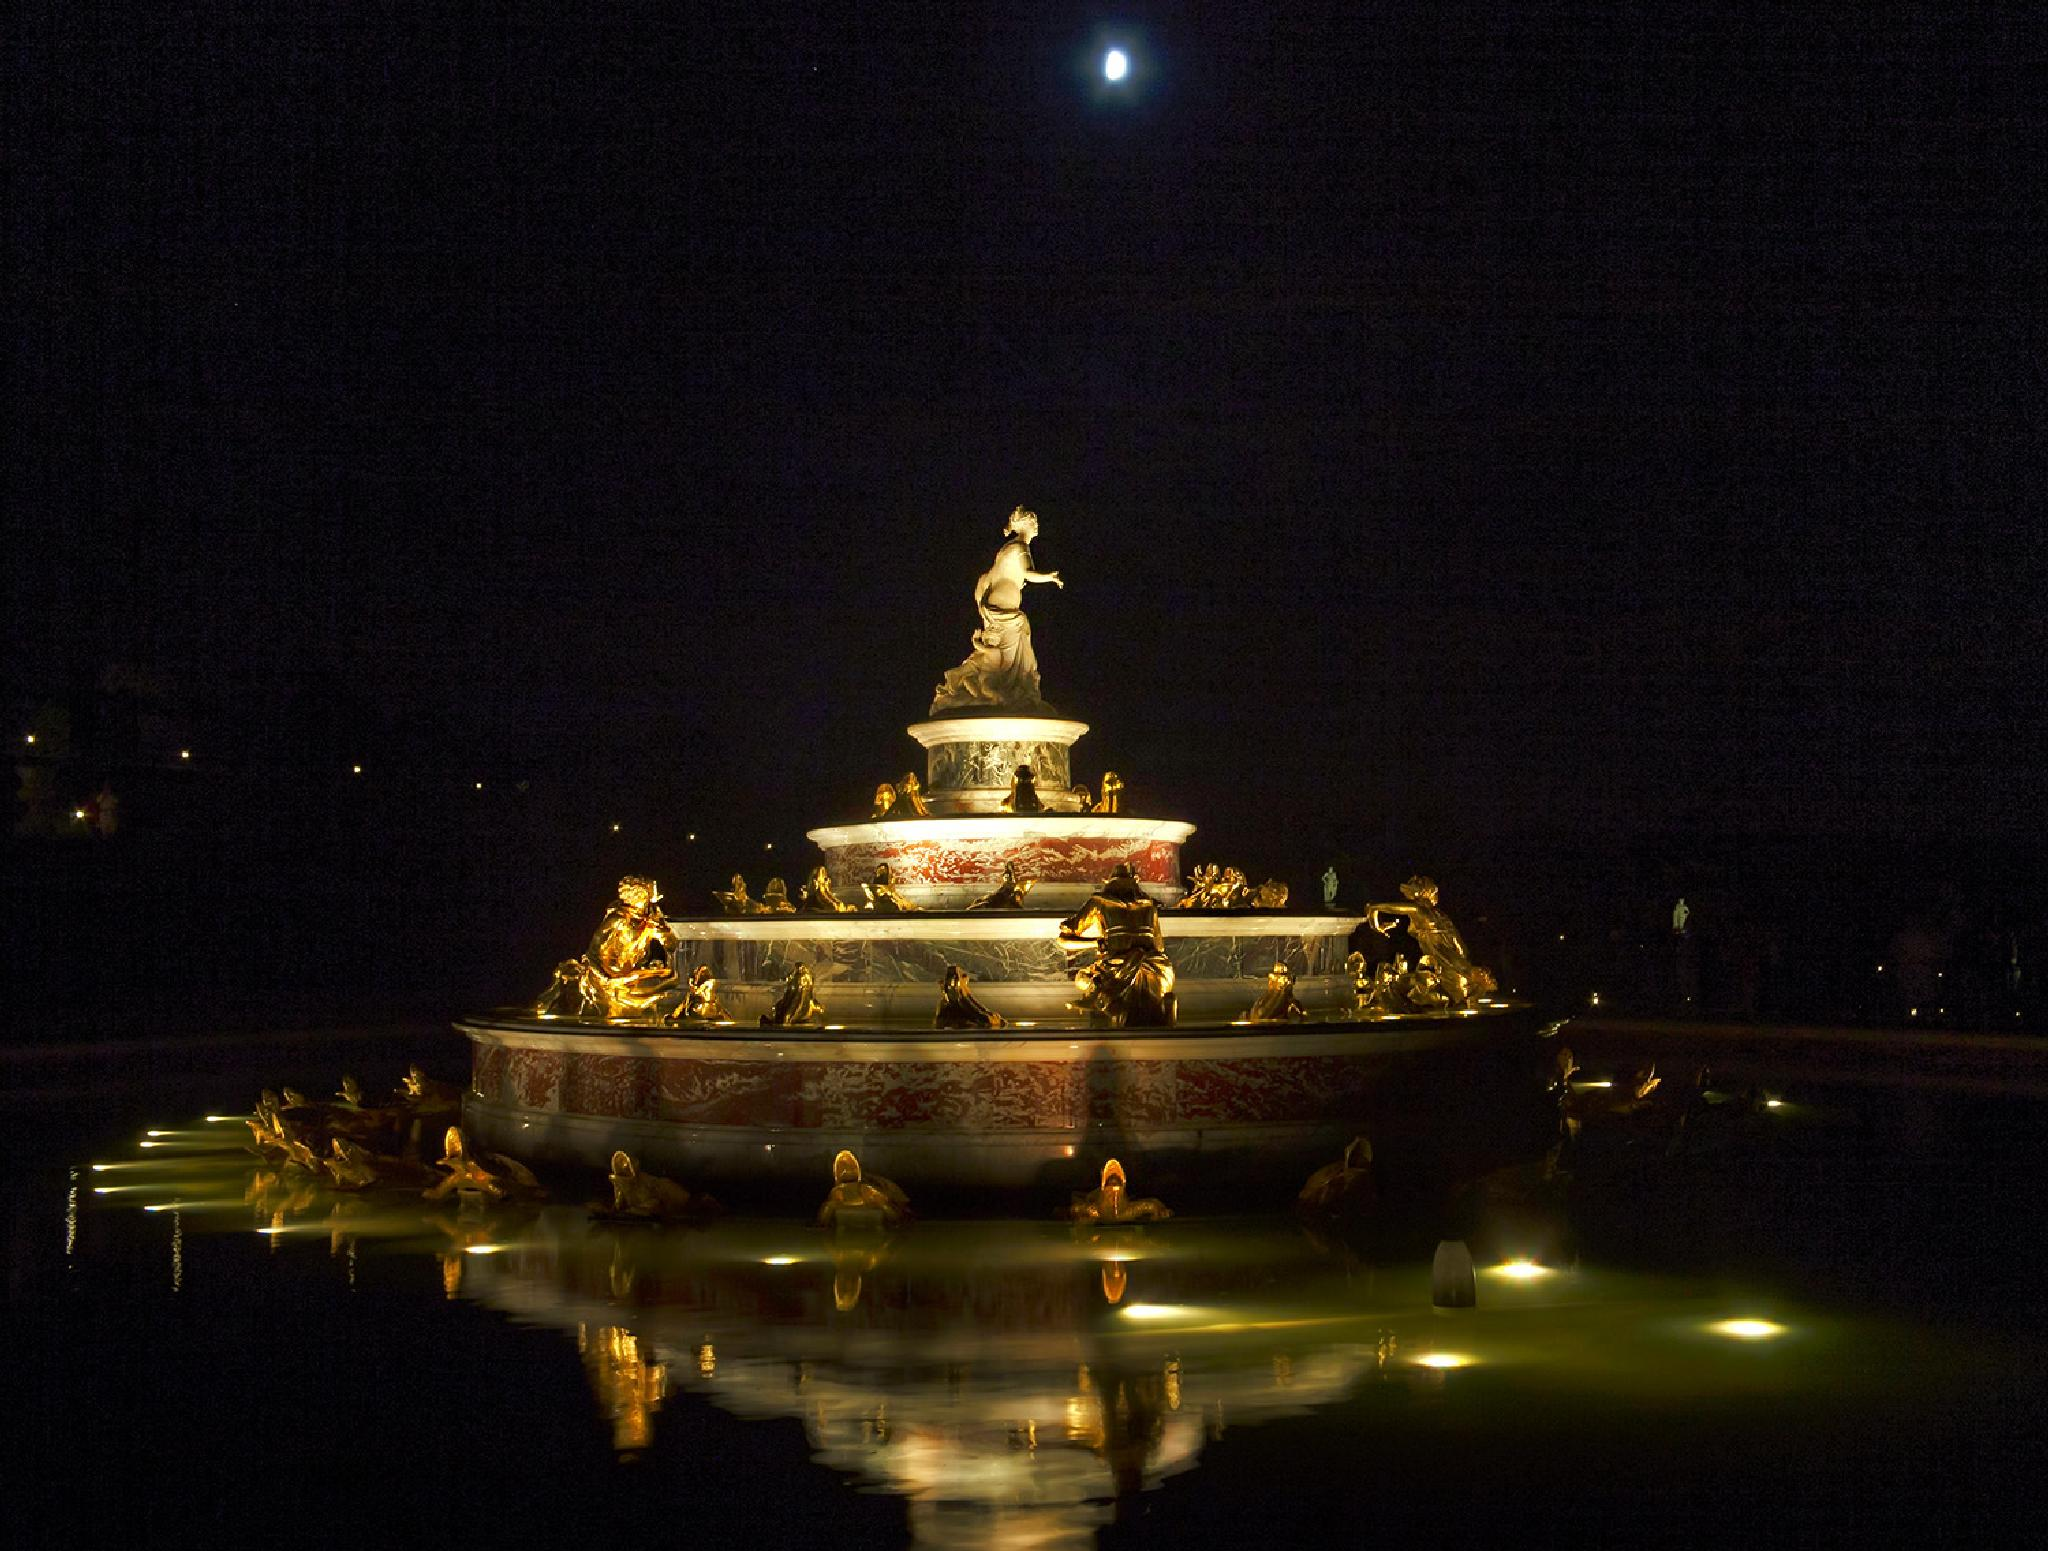 Versailles at Night + Moon by harald.seiwert